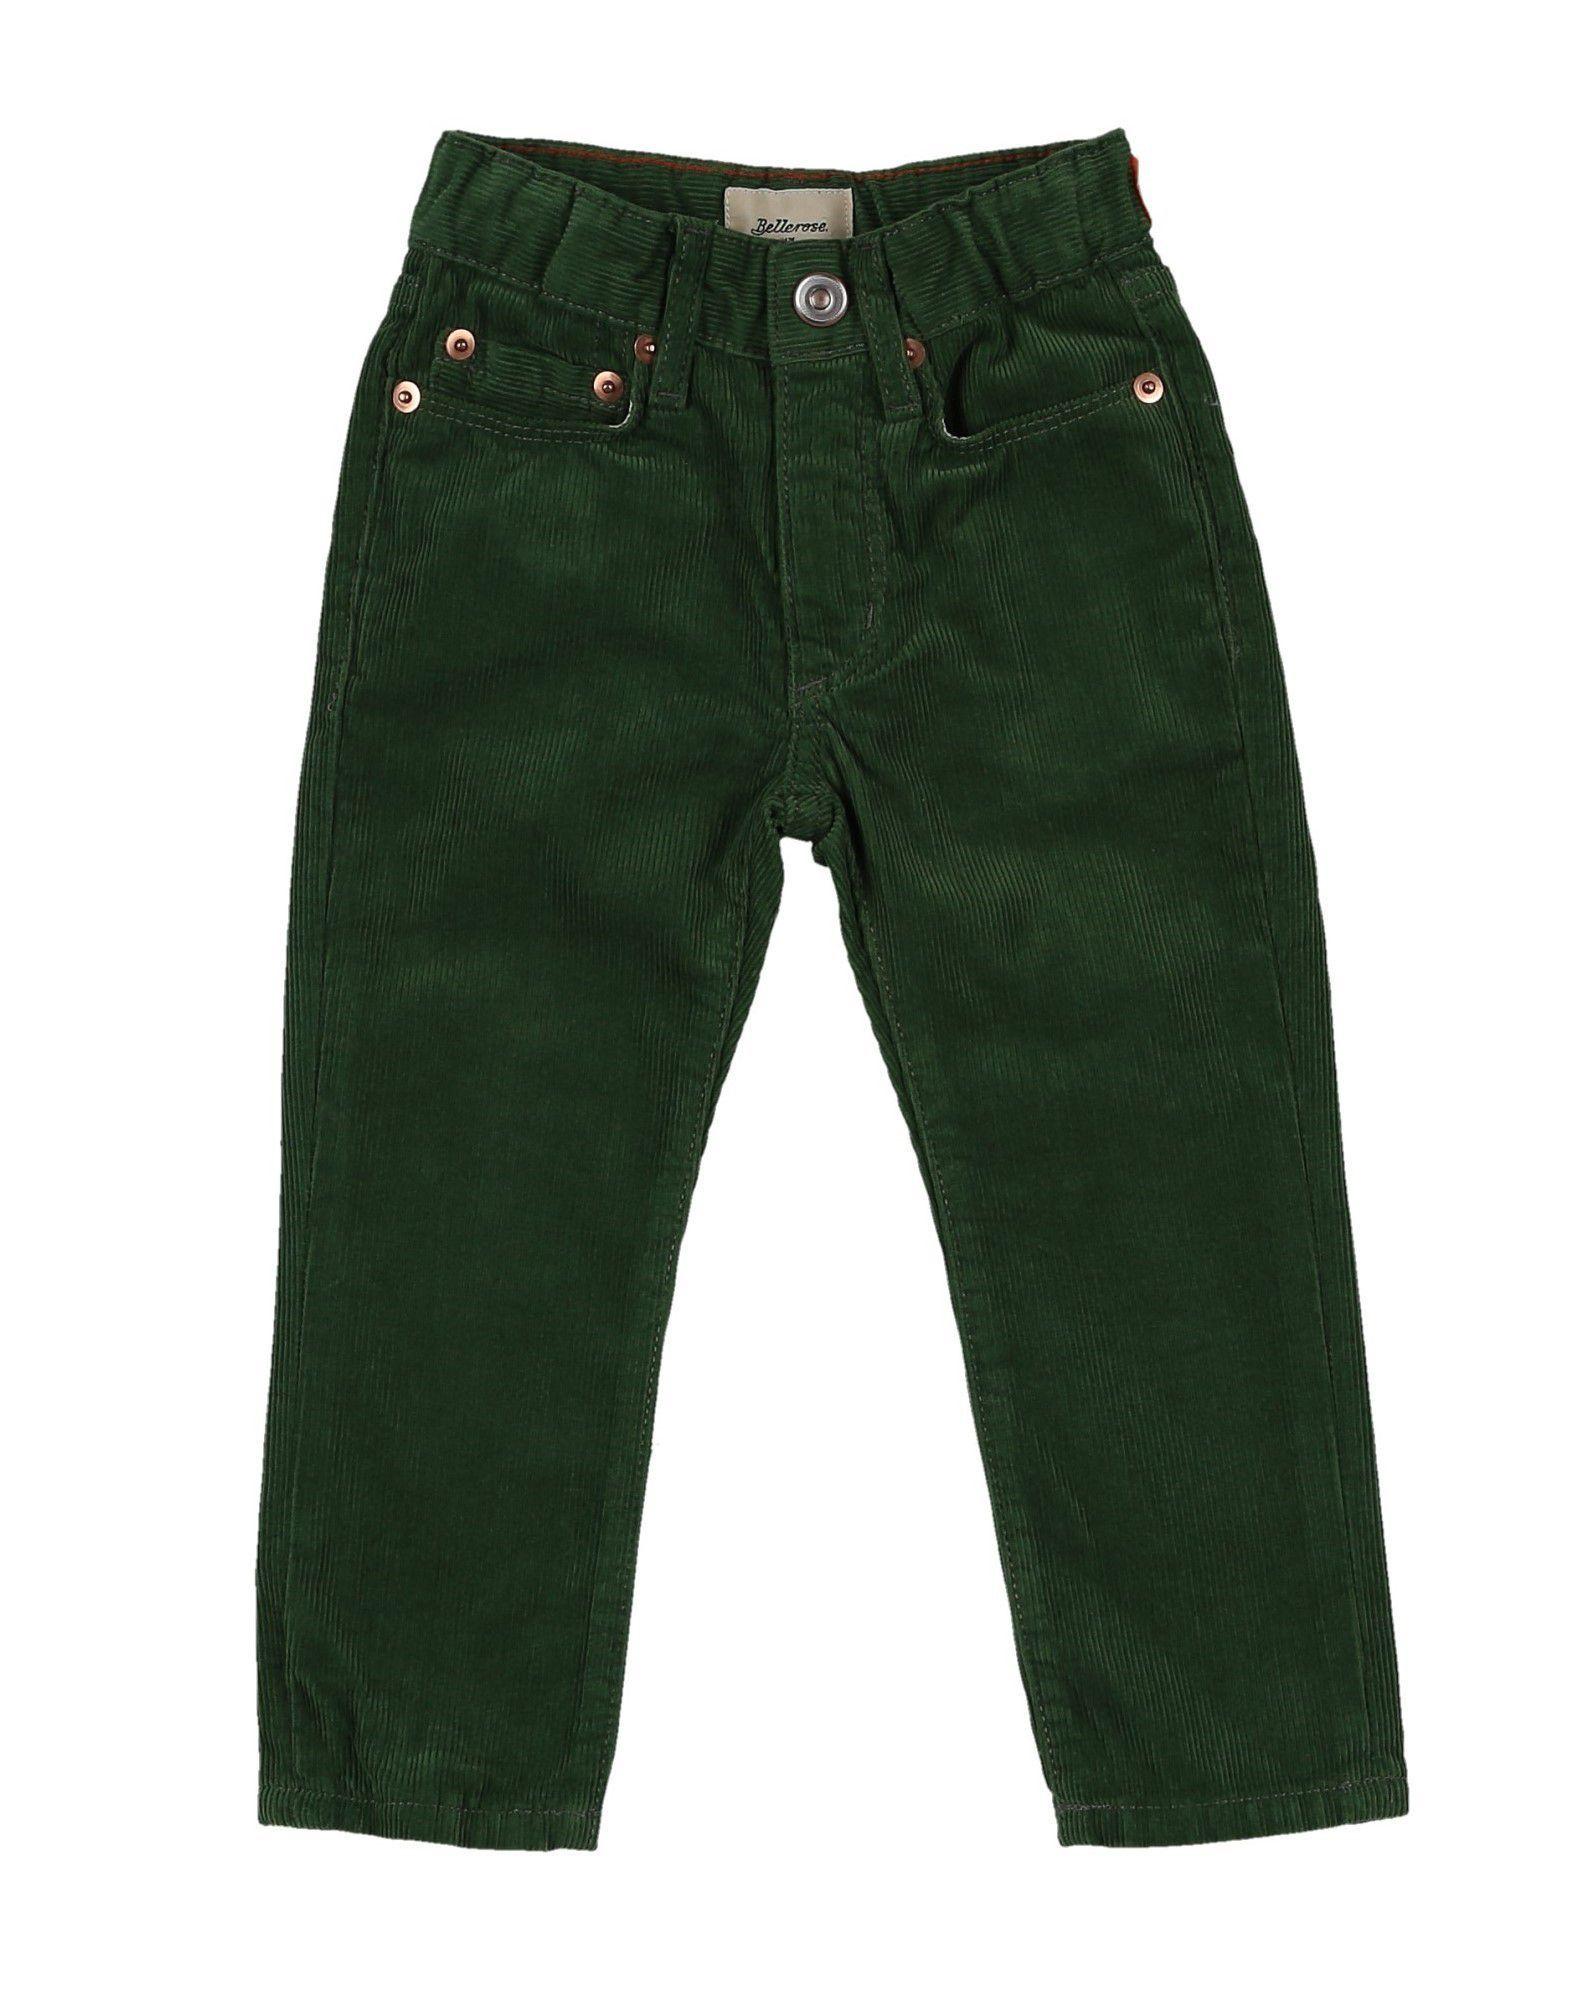 TROUSERS Bellerose Green Boy Cotton